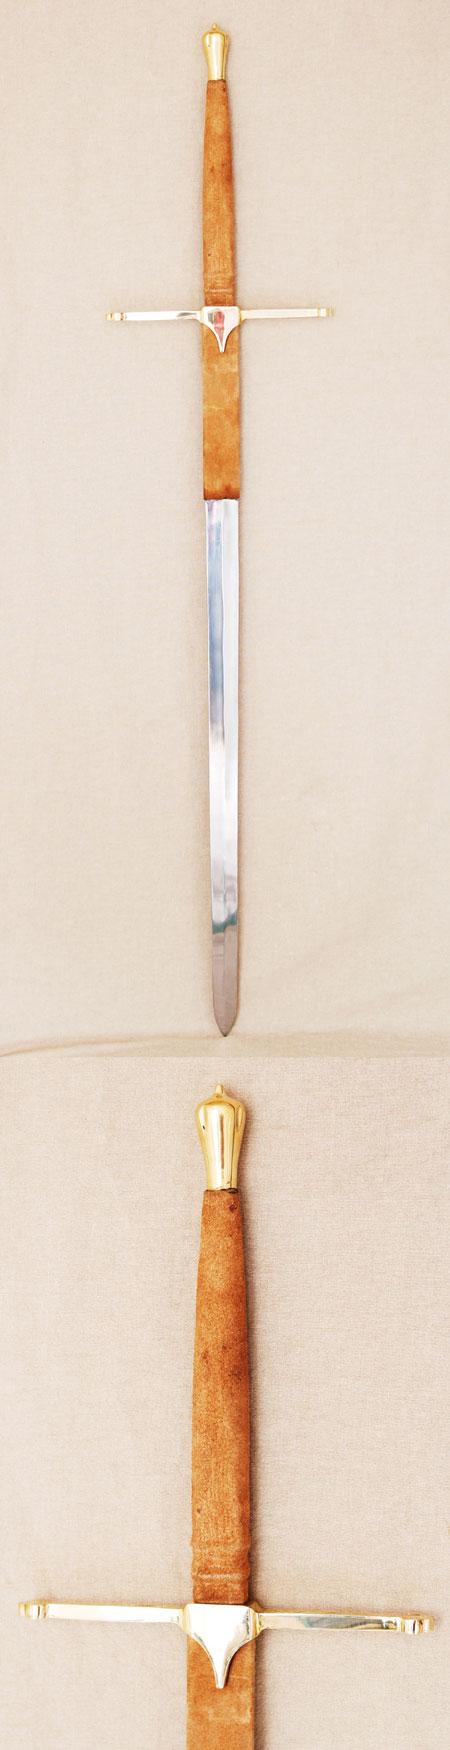 Braveheart - Schwert